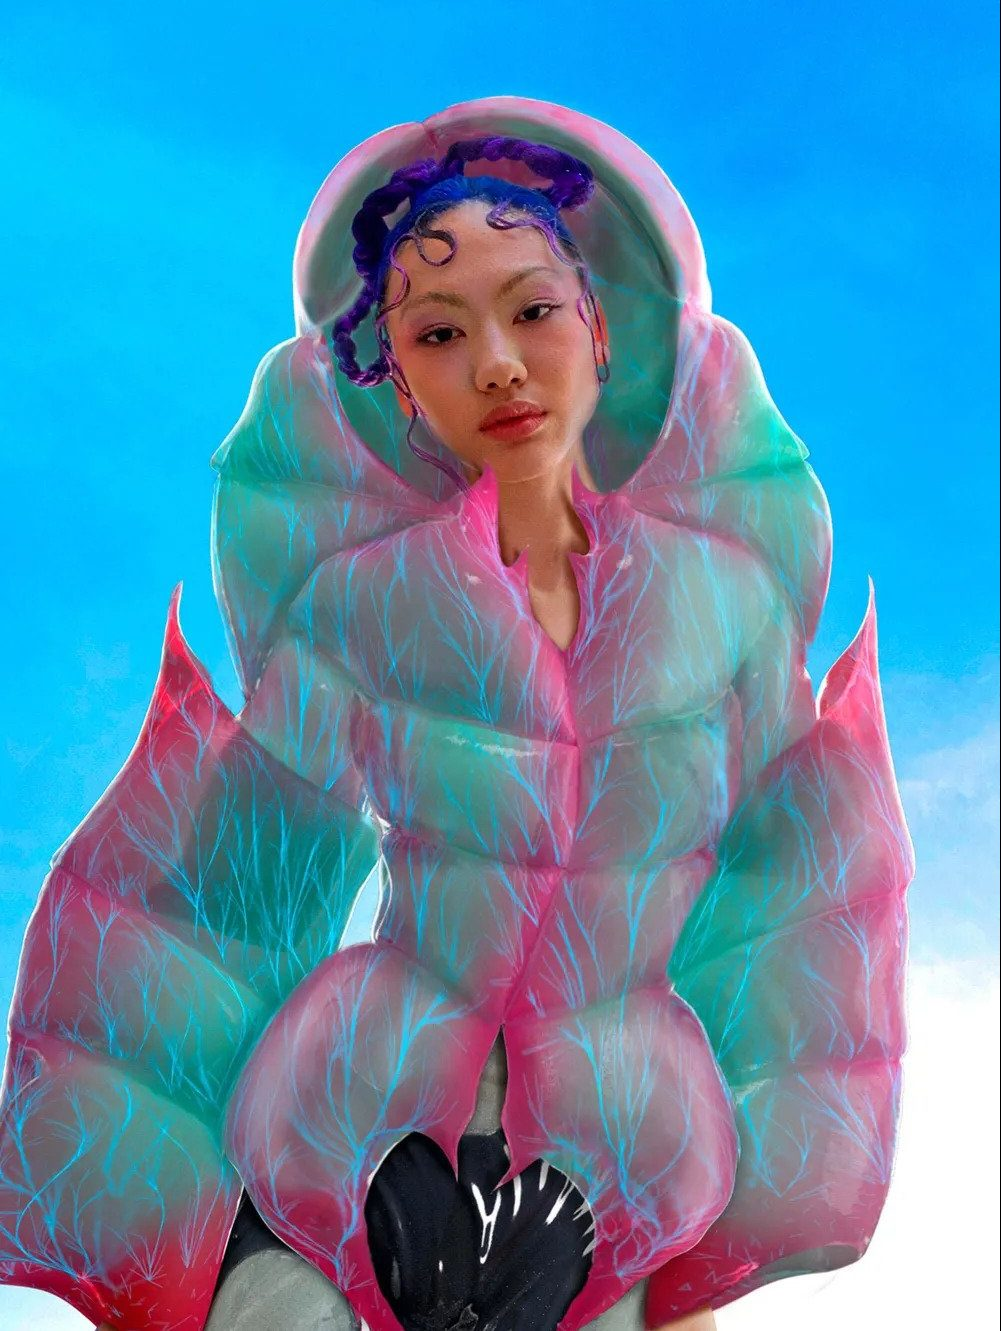 Virtual model poses in virtual clothing for Auroboros